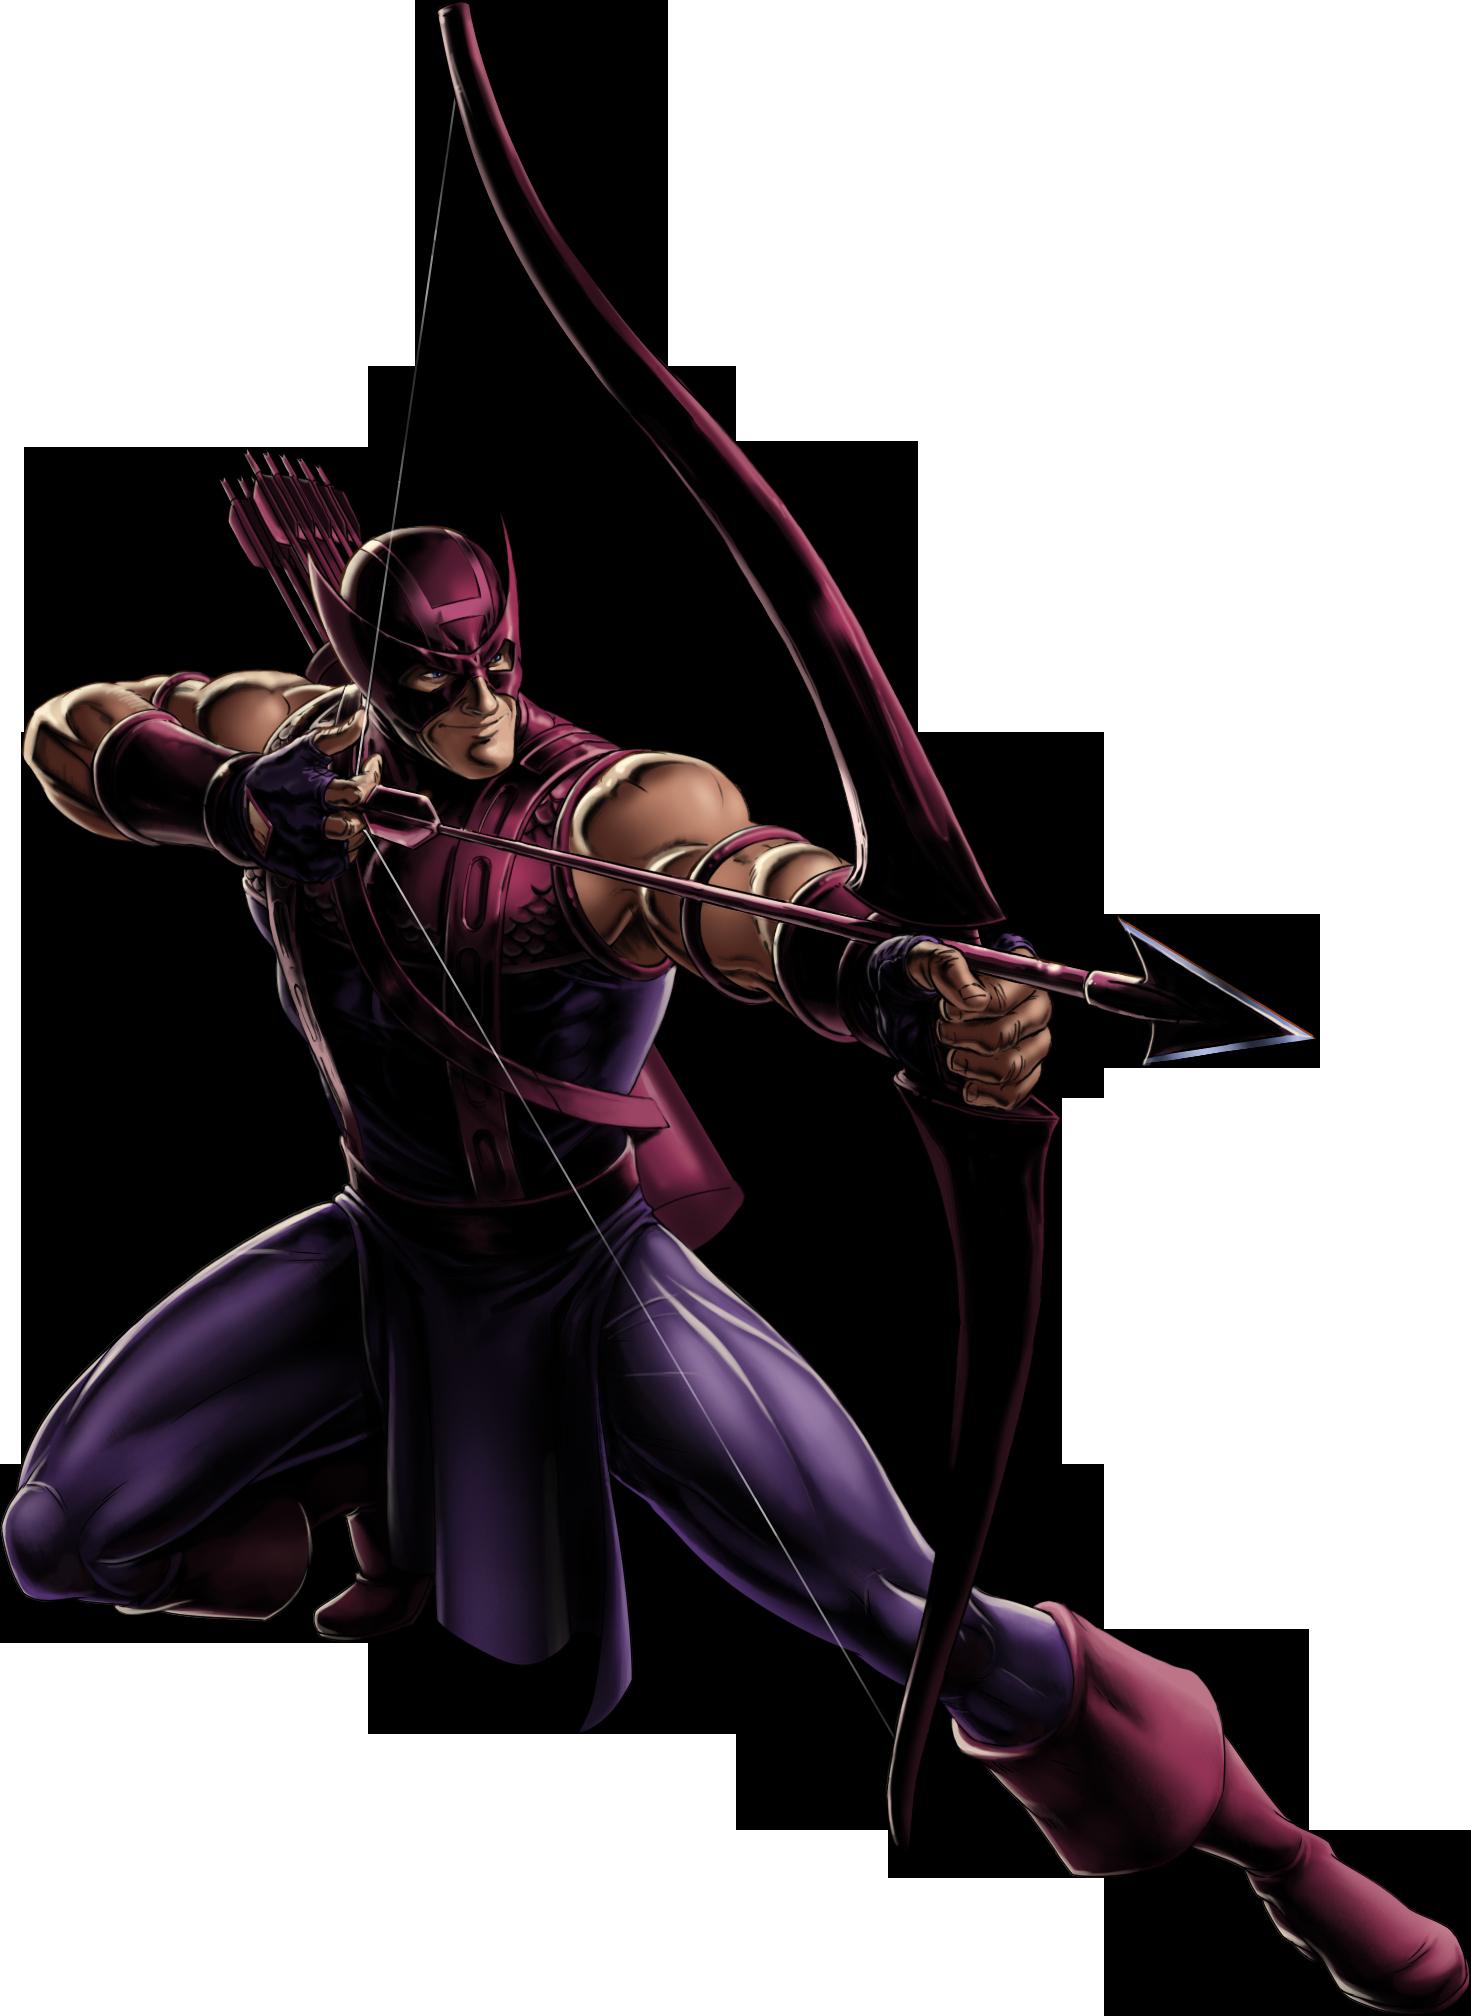 Hawkeye Clint Barton Super Heroi Vilas